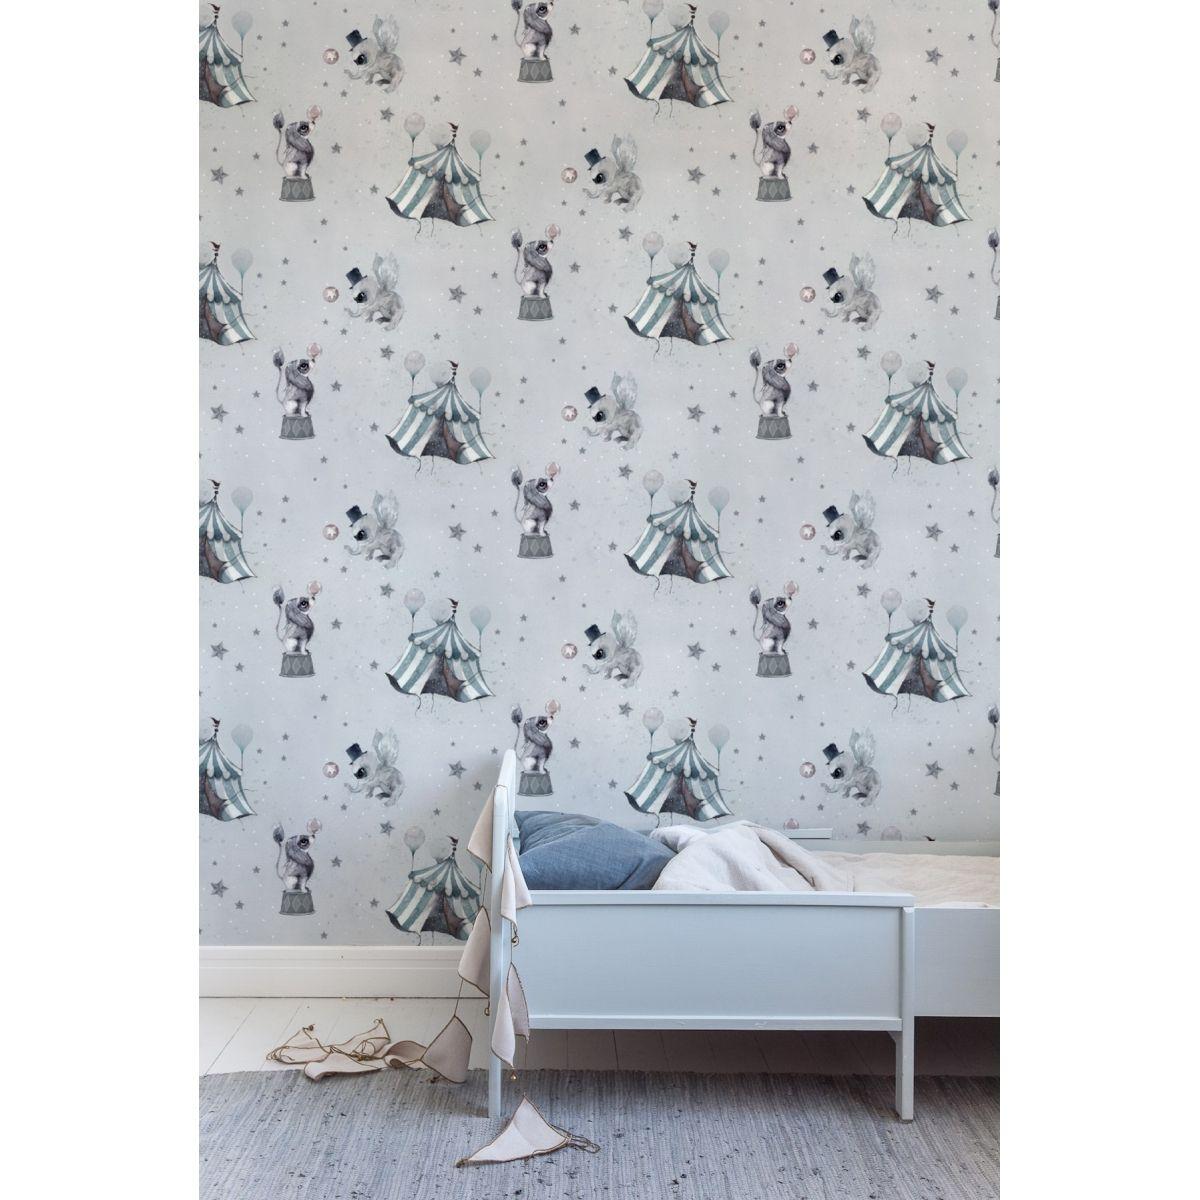 Mrs. Mighetto - The Wallpaper Circus Mighetto blue-grey - 1